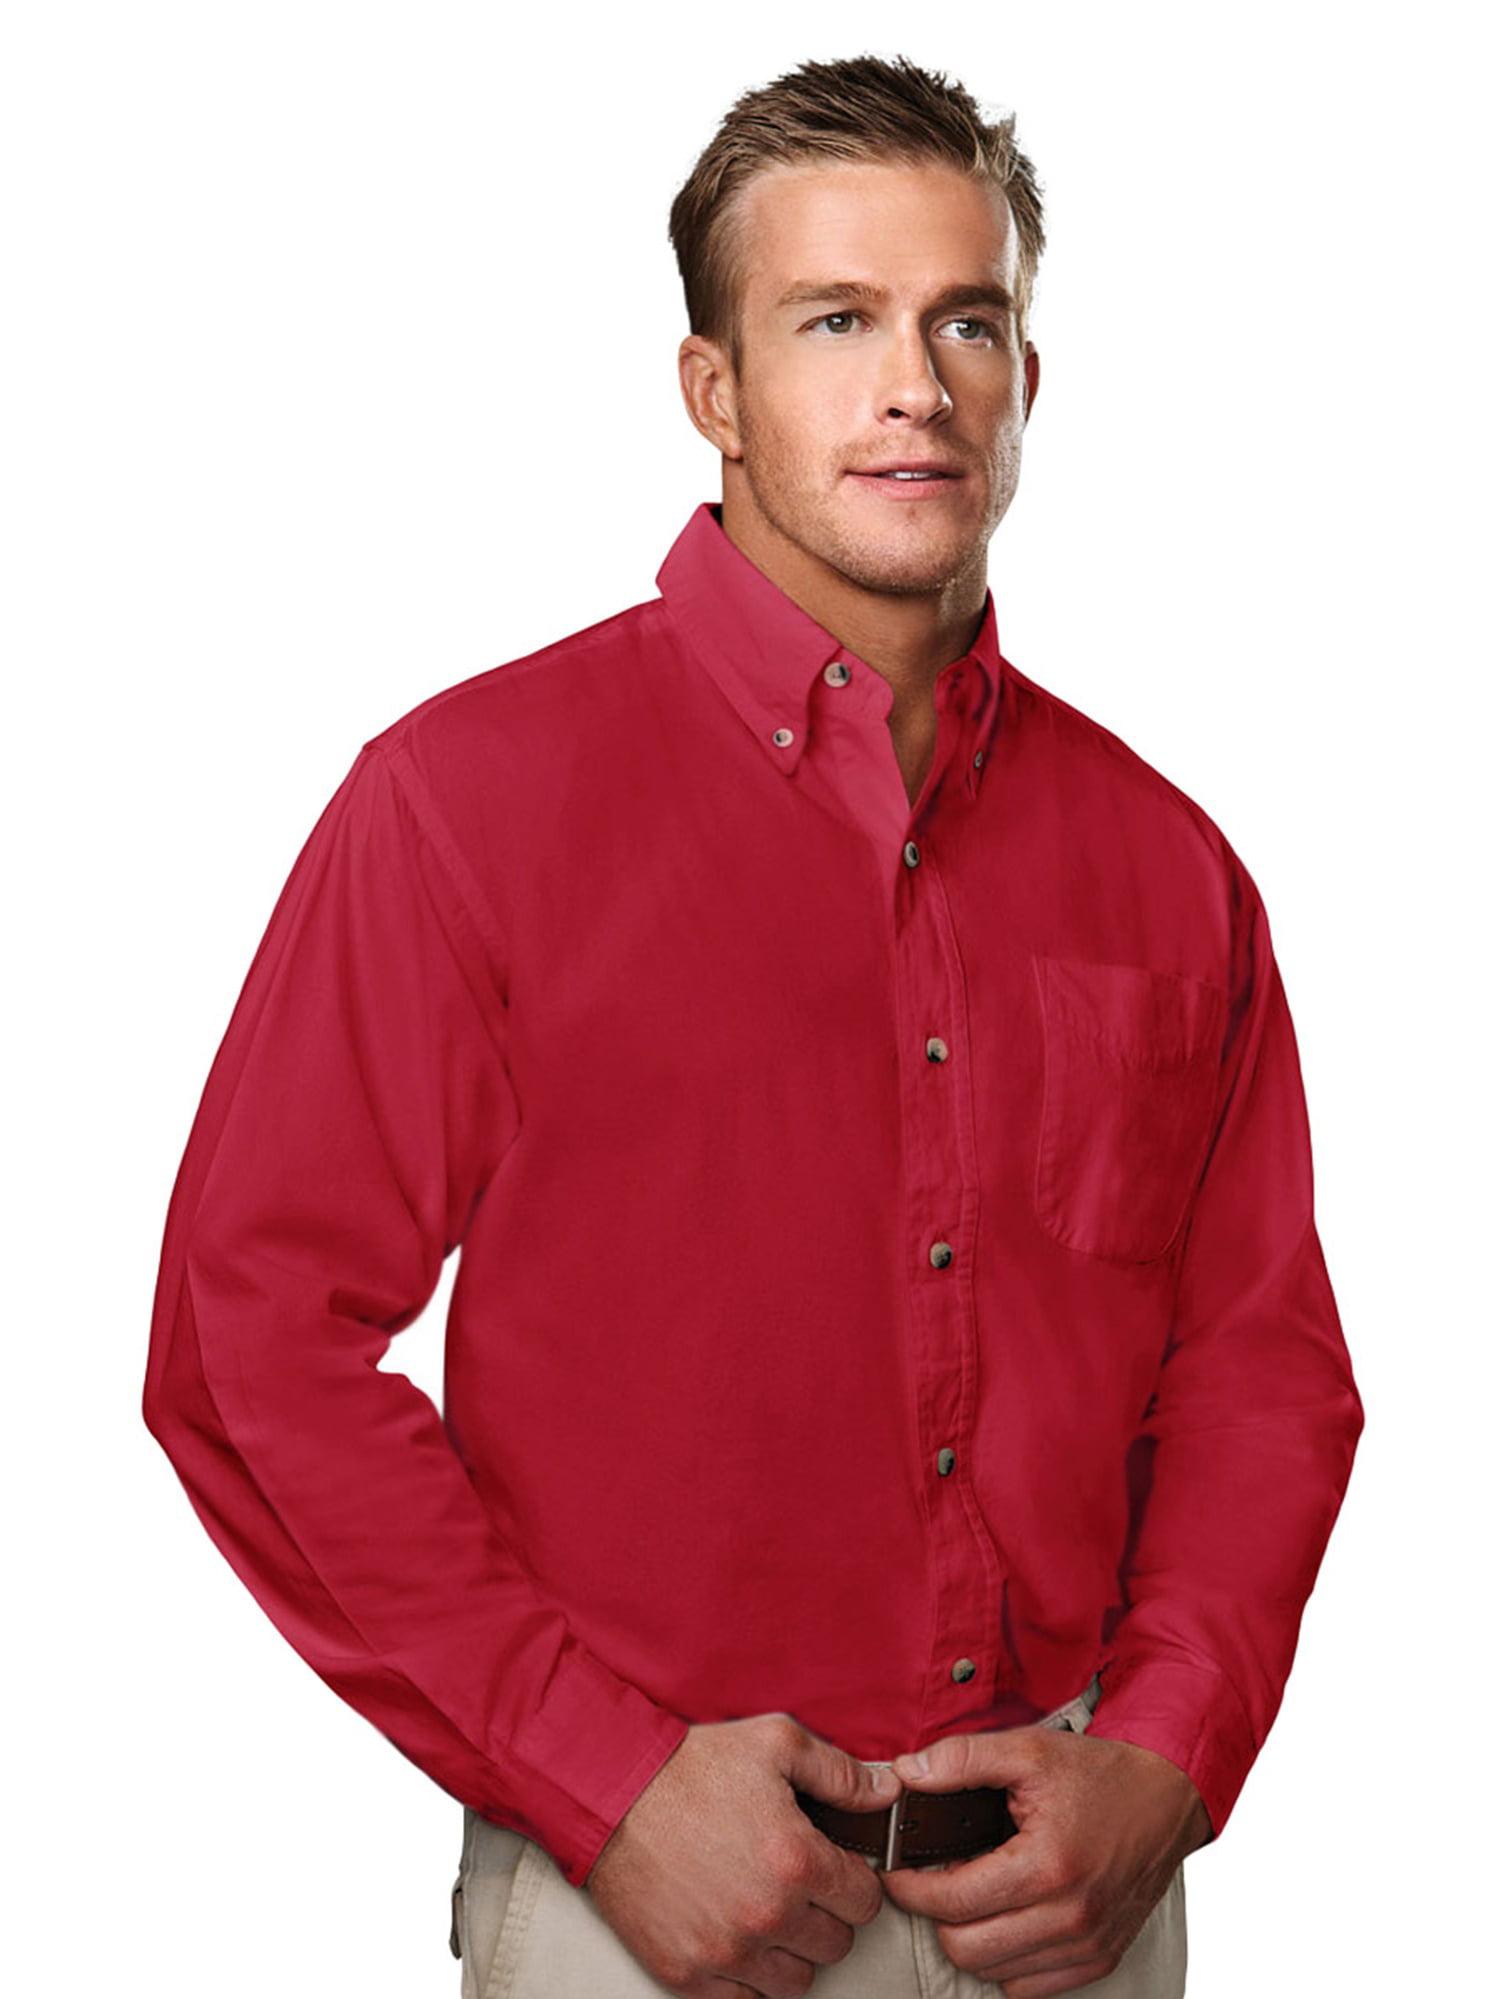 Tri-Mountain Men's Big And Tall Woven Dress Shirt